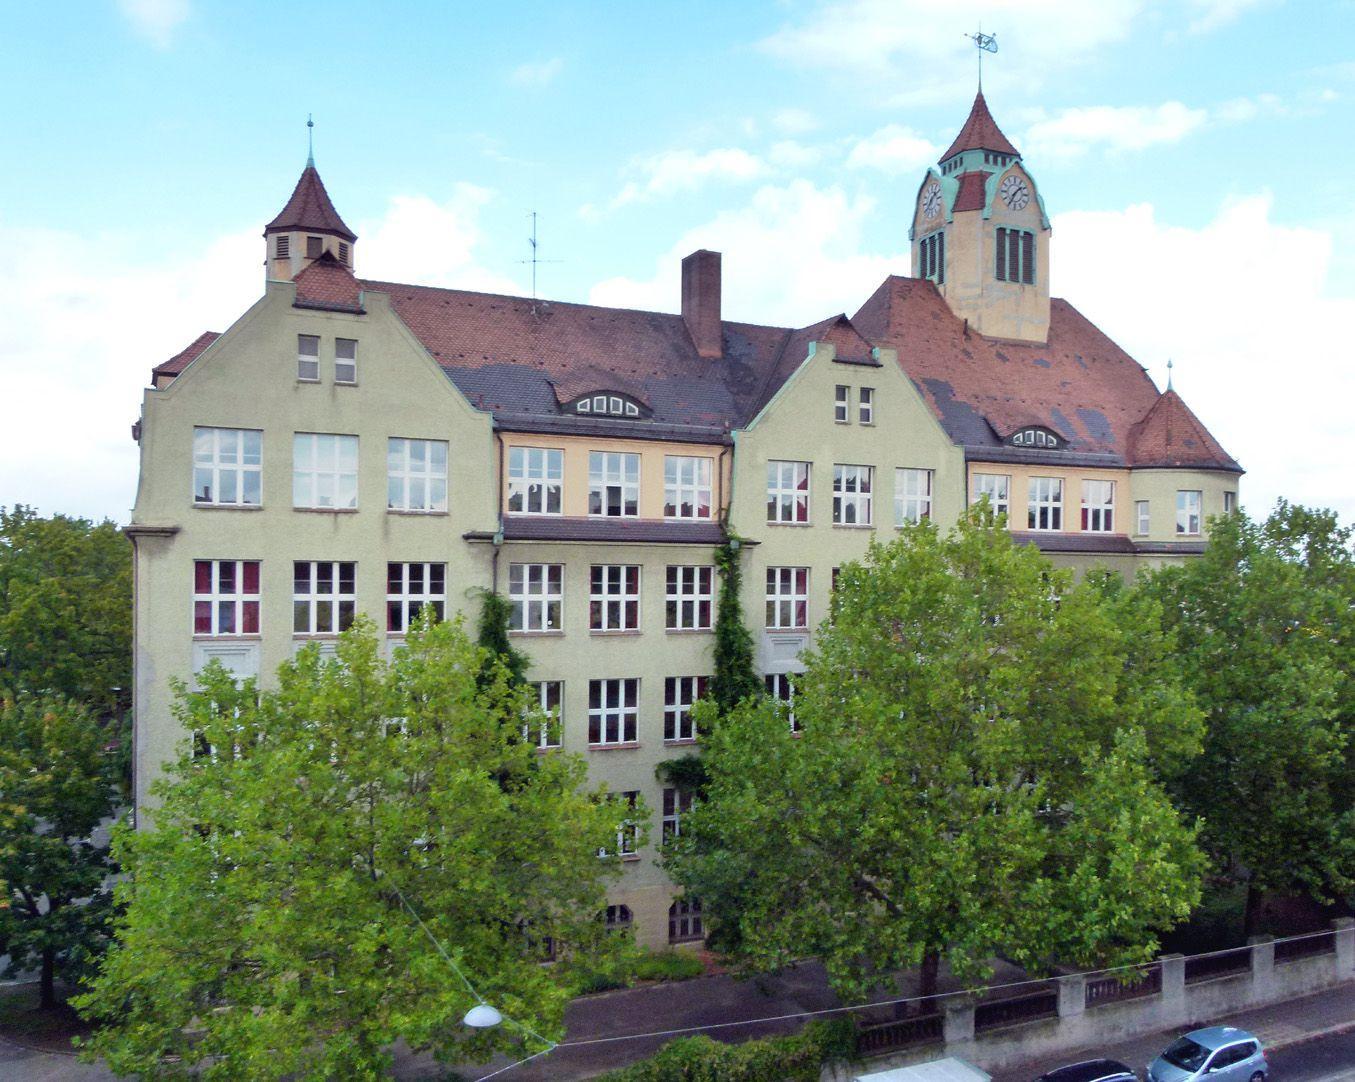 Ludwig-Uhland-School View Grolandstraße